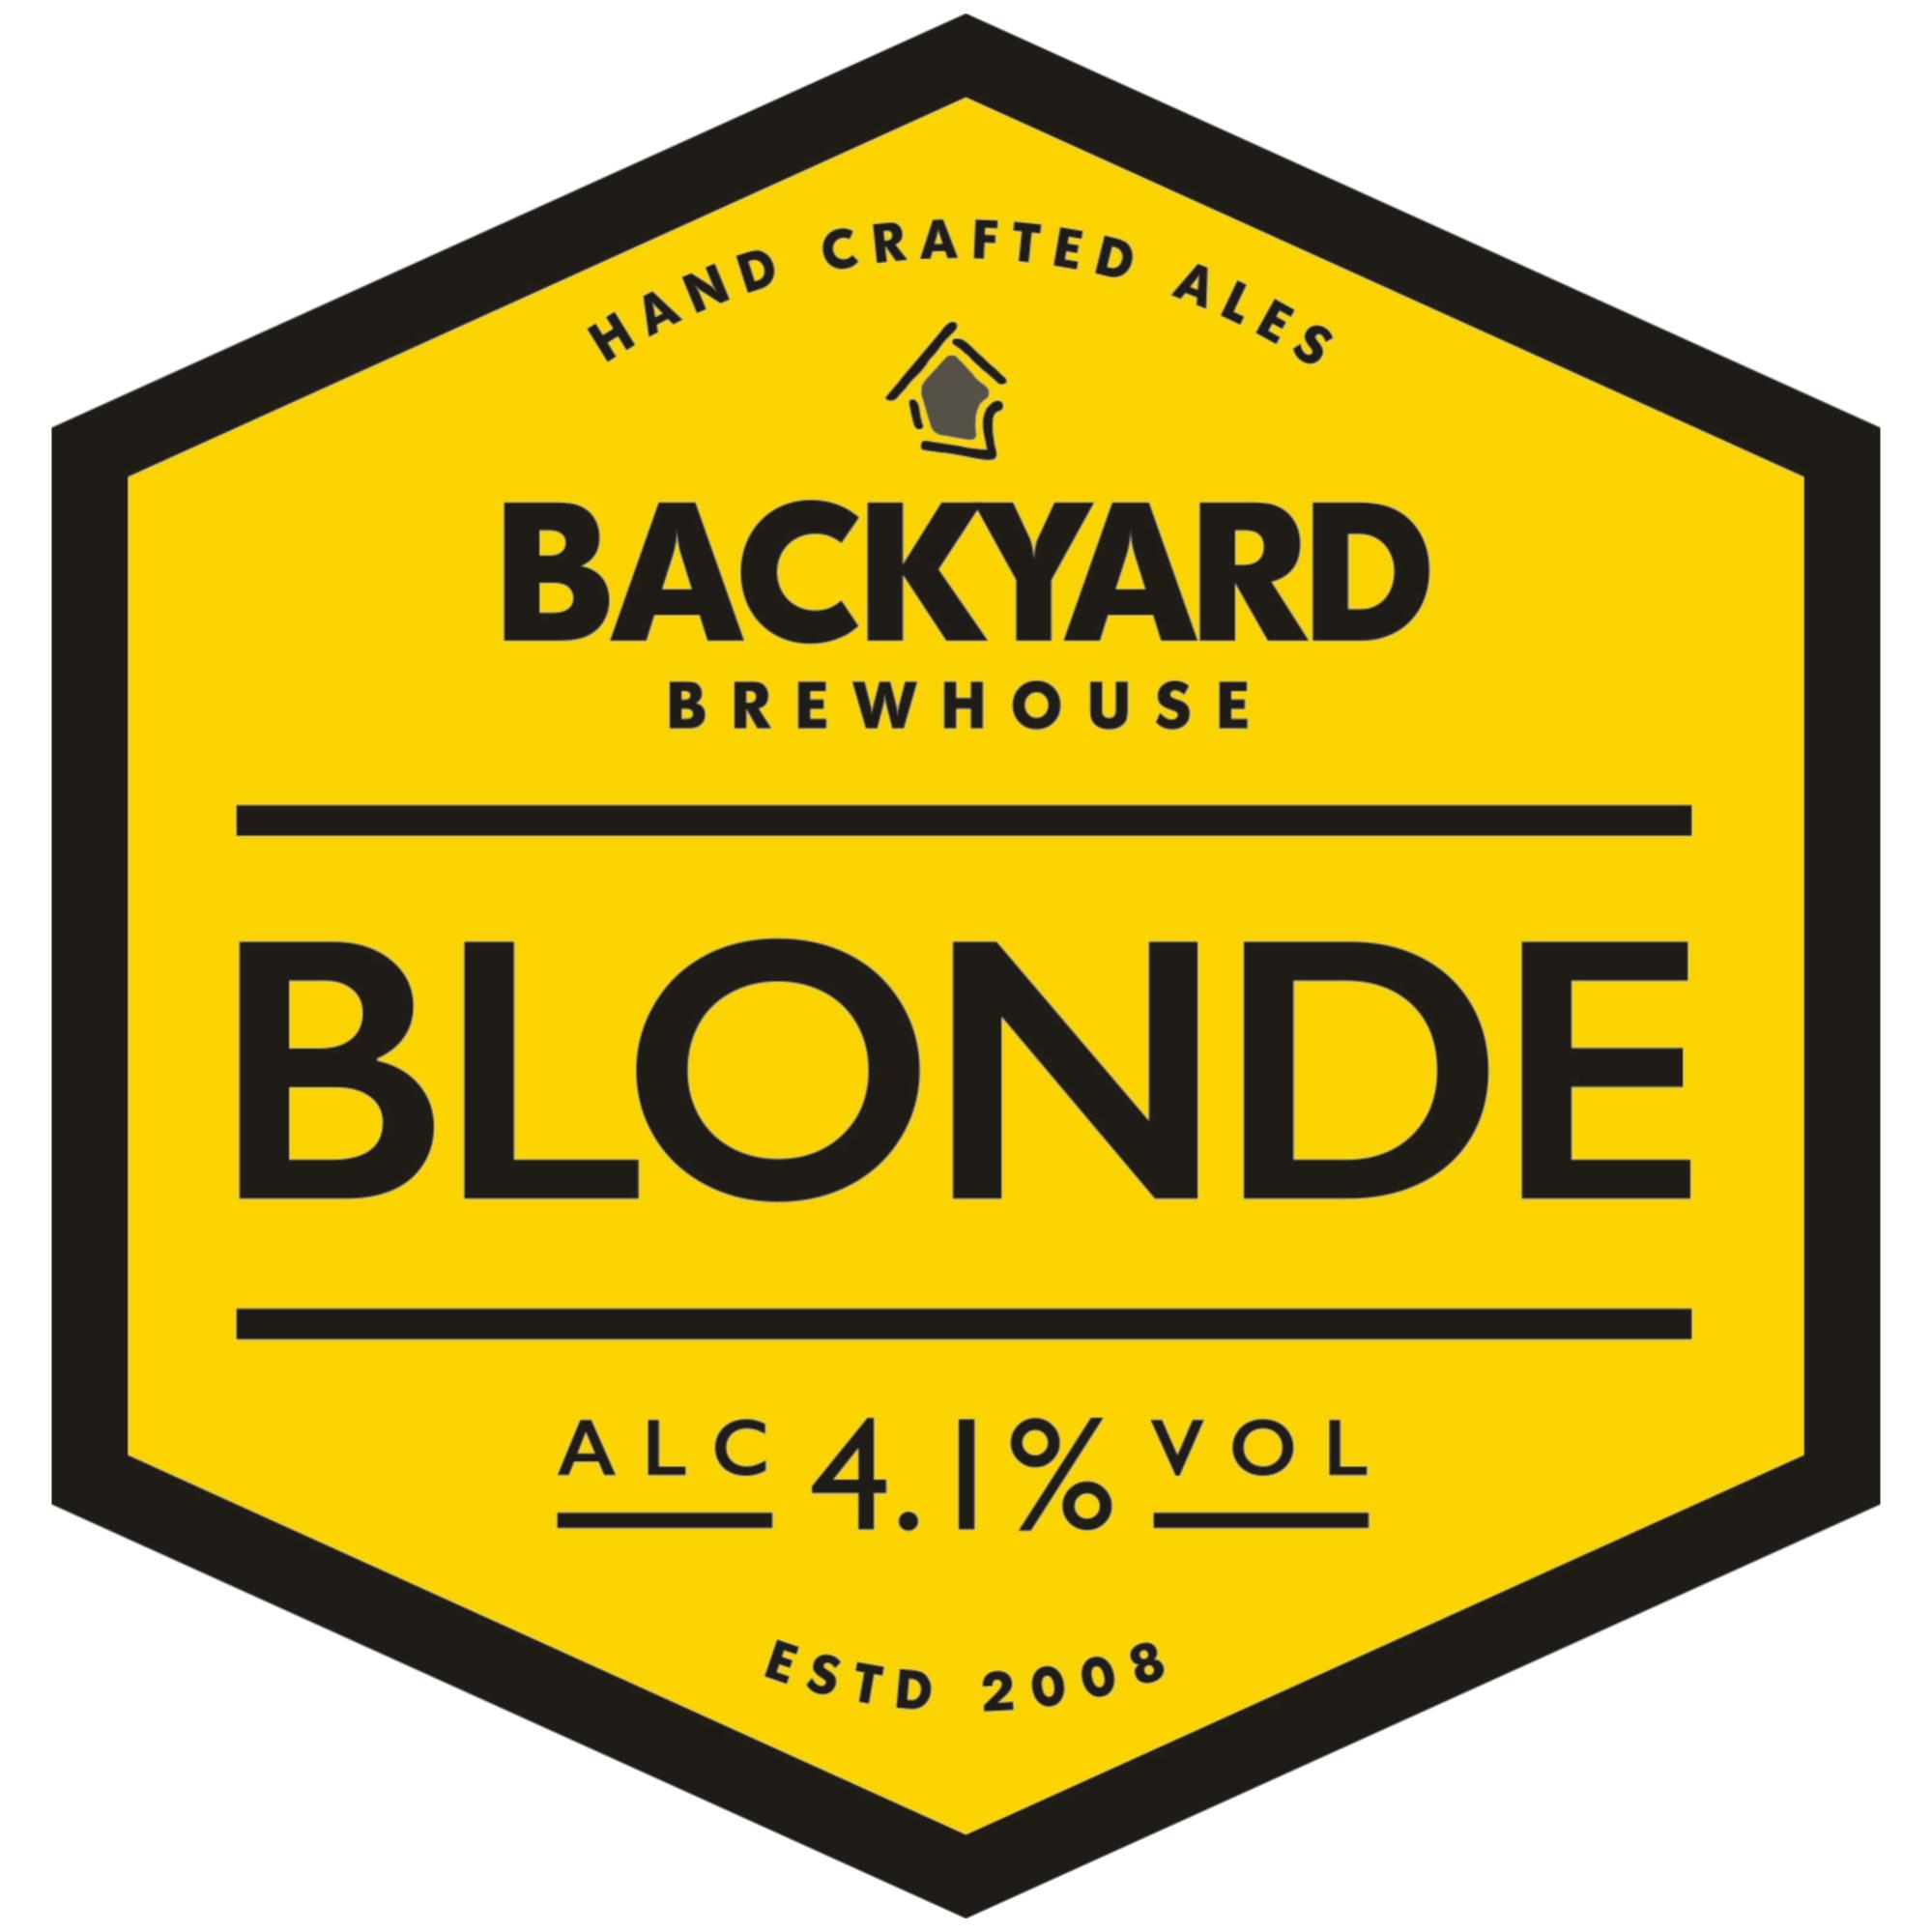 Backyard Blonde 9 Gallons Blonde 4.1%